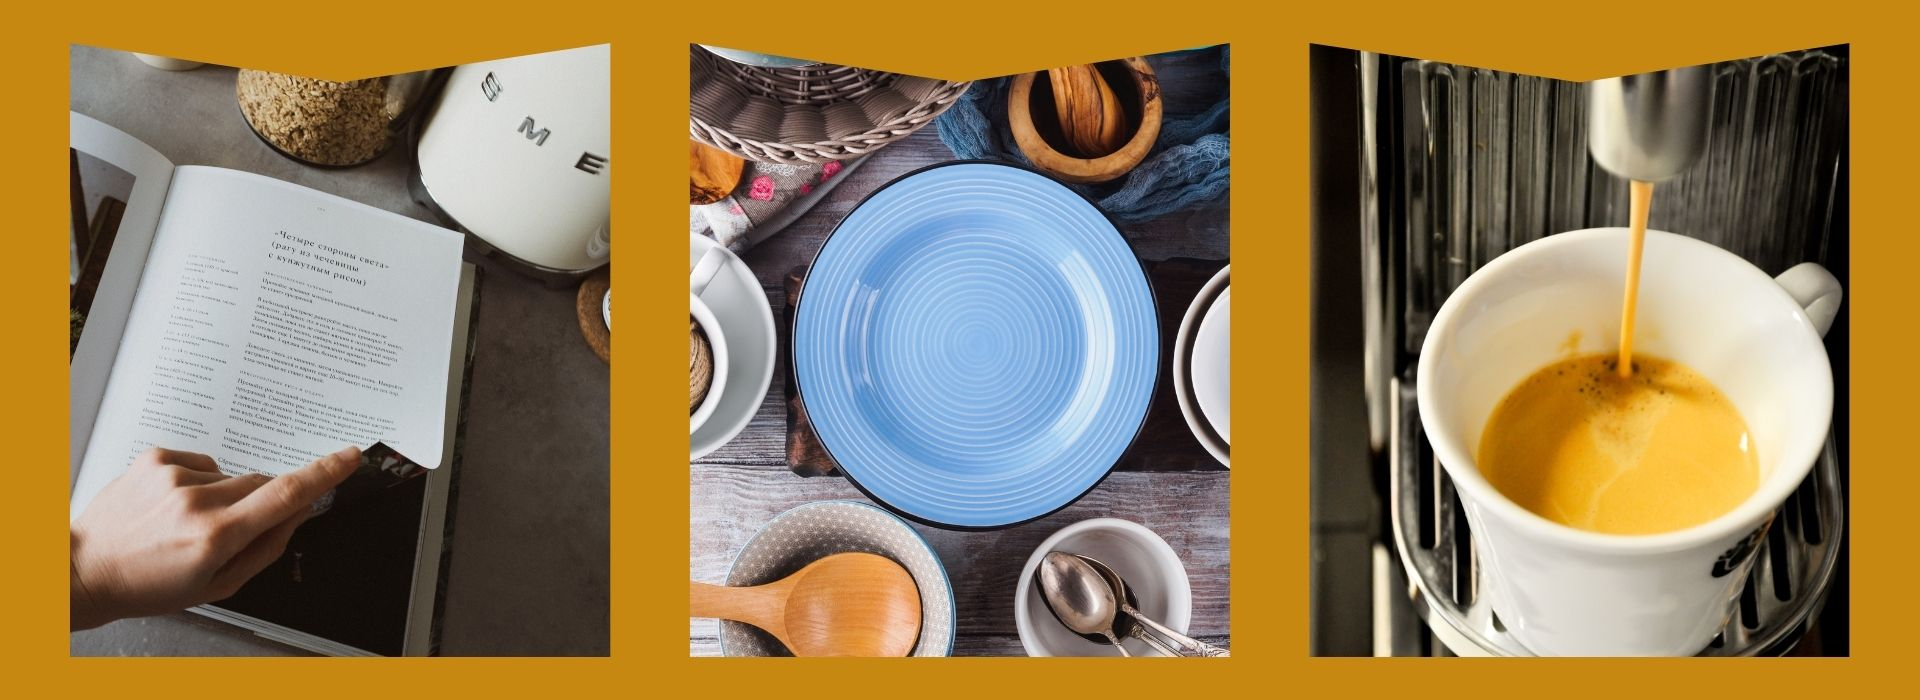 Cooking book, plates, nespresso machine